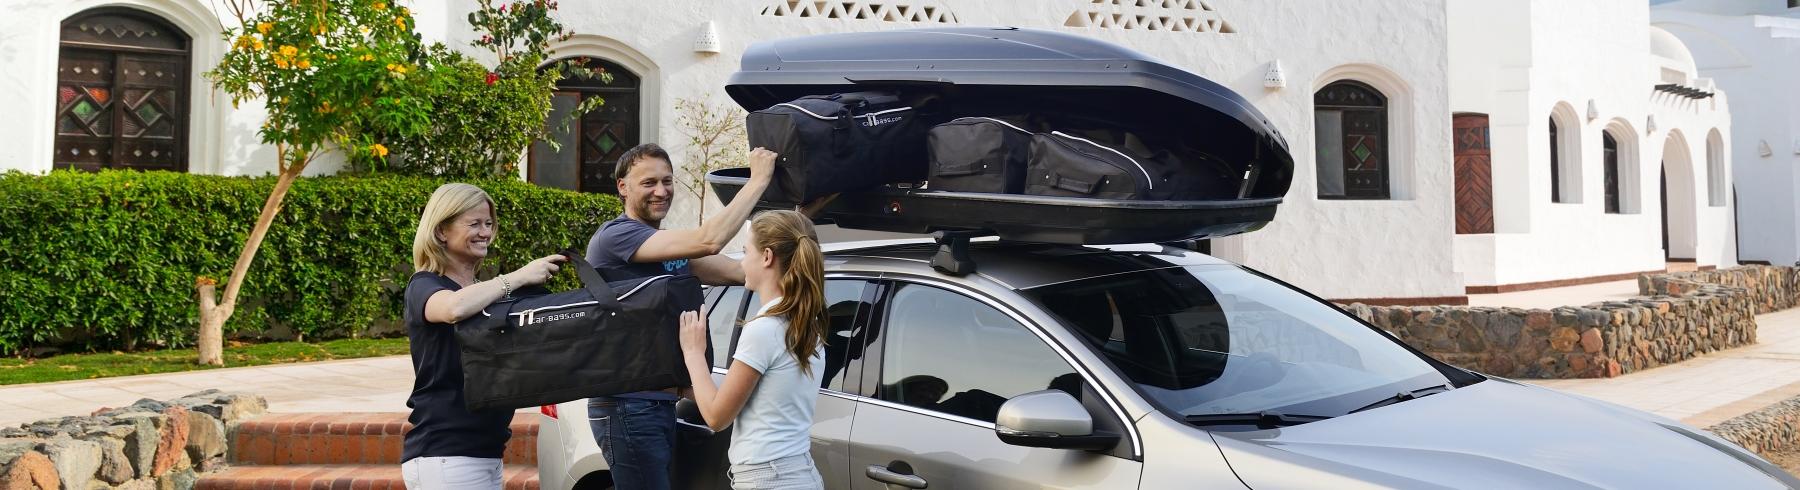 car-bags-roof-box-bags-unloading-summer